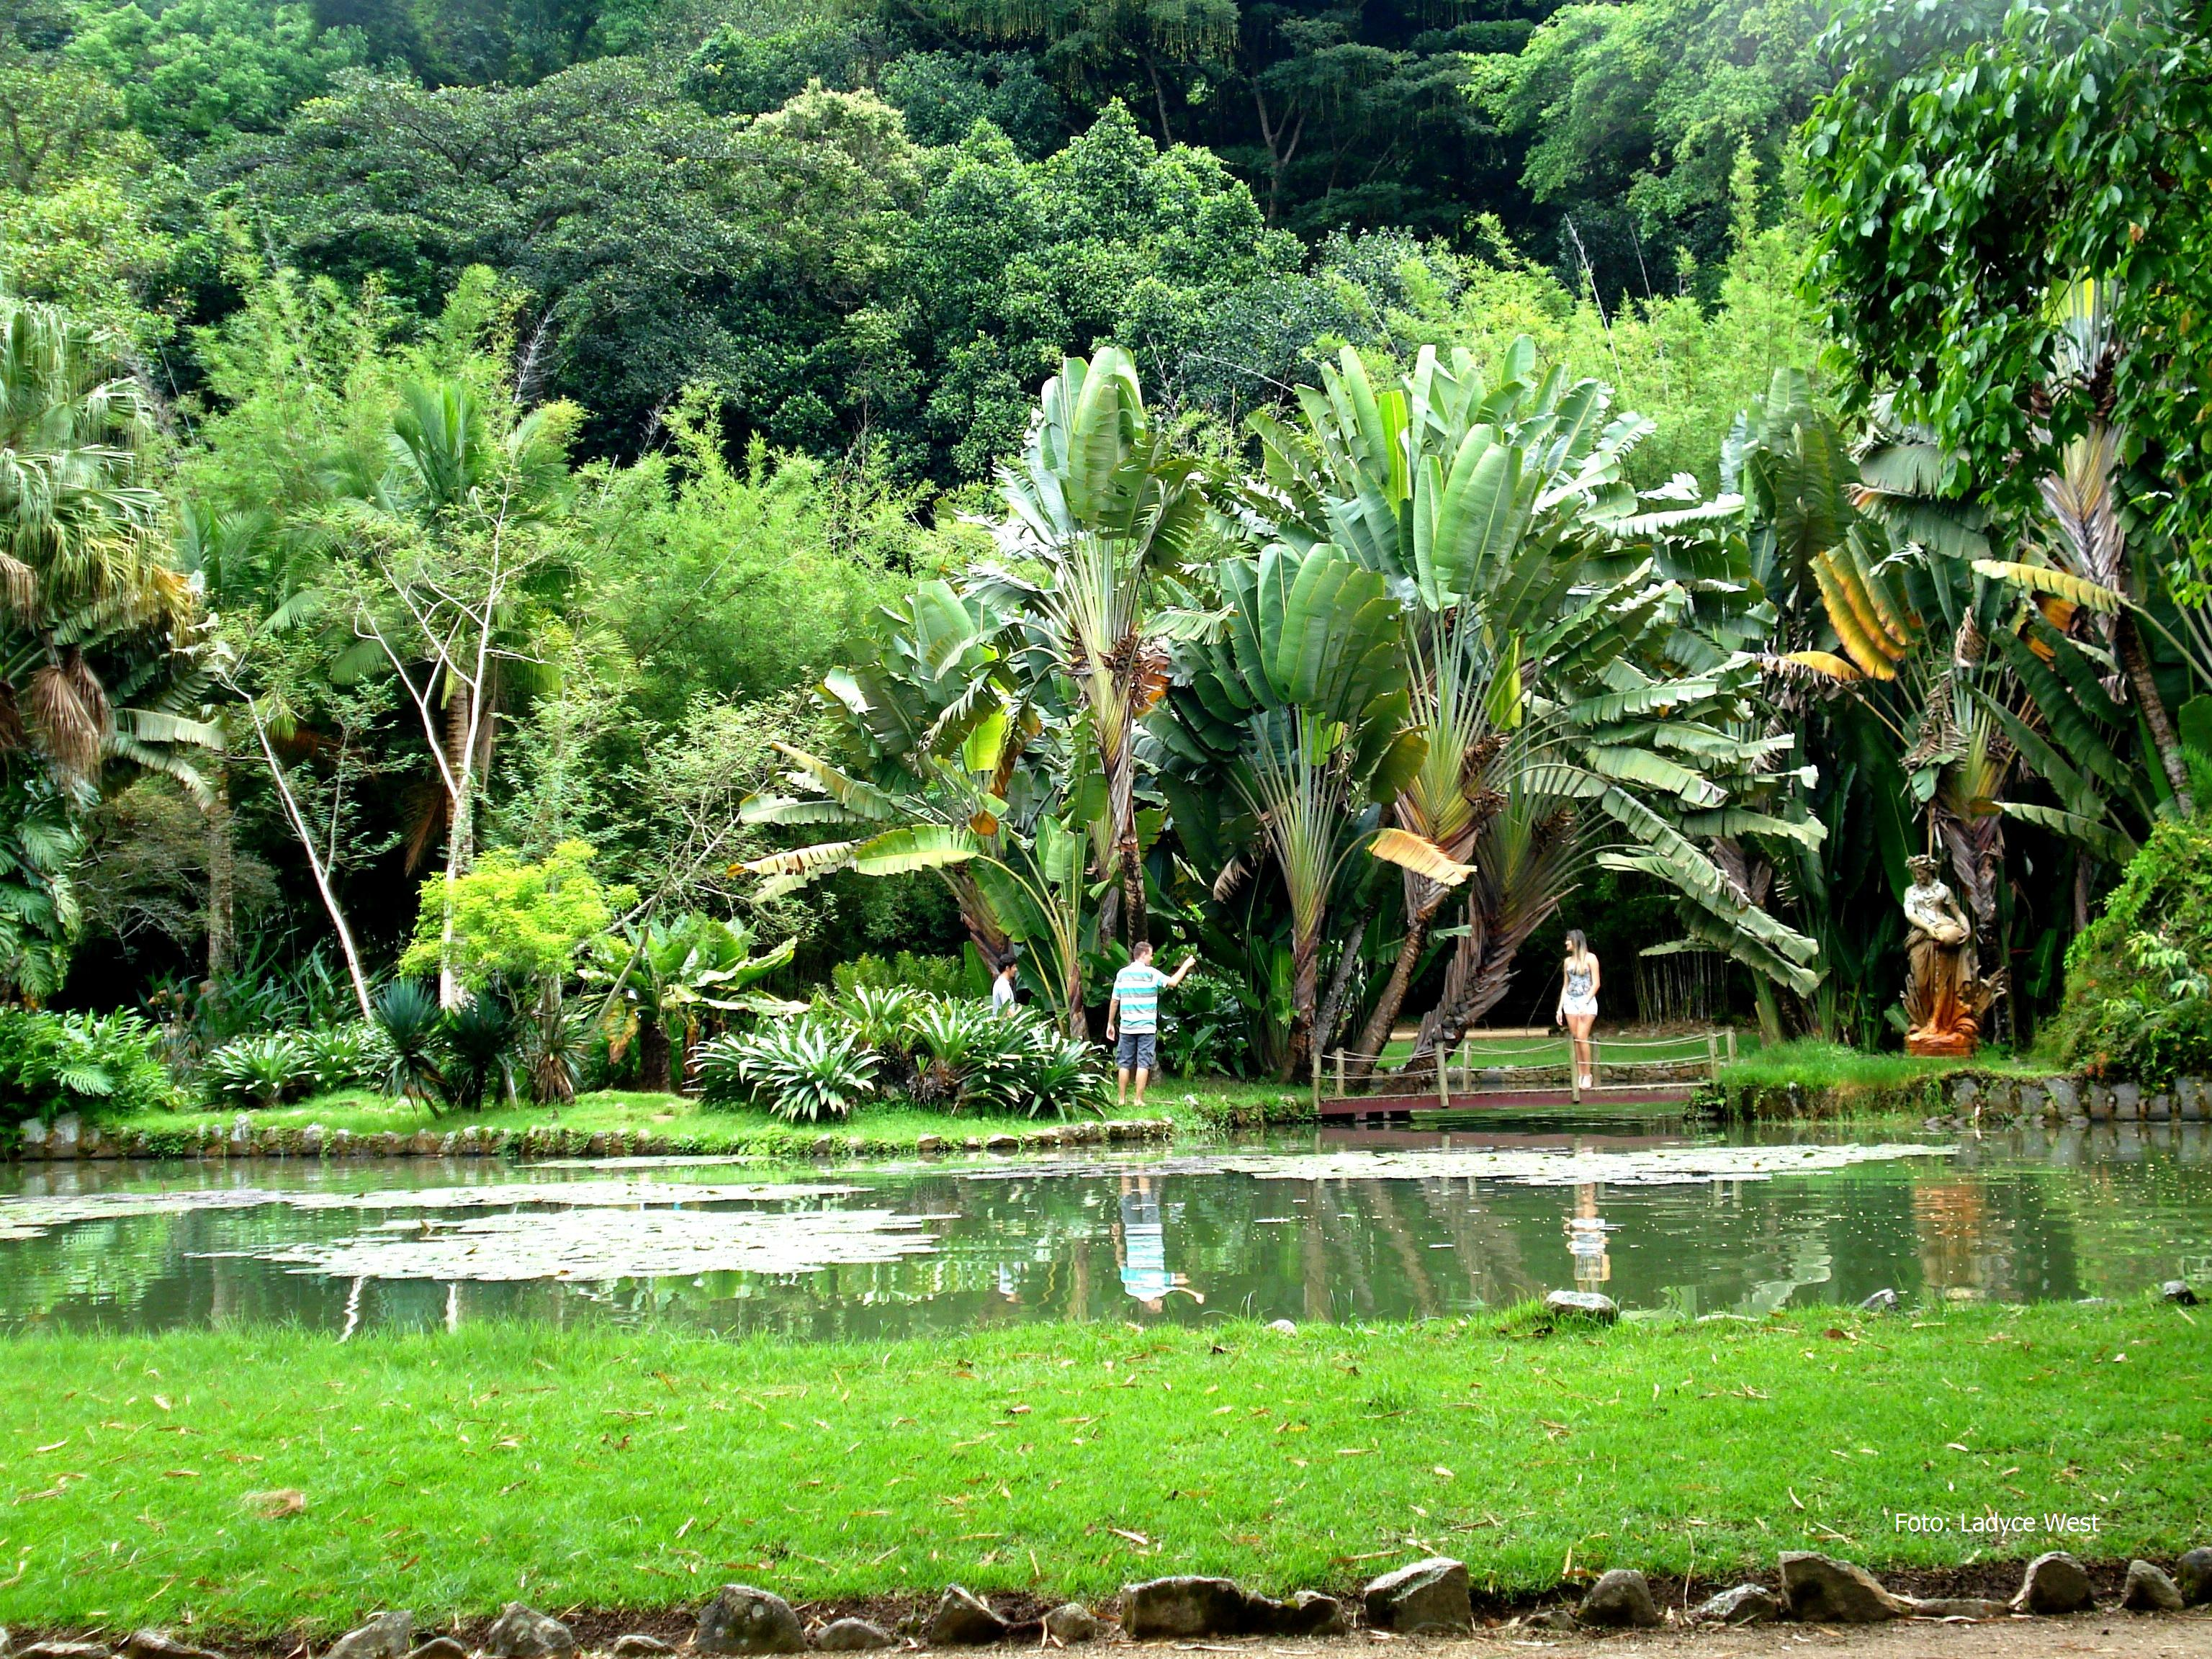 fotos jardim botanico do rio de janeiro:Jardim Botânico do Rio de Janeiro em fim de tarde